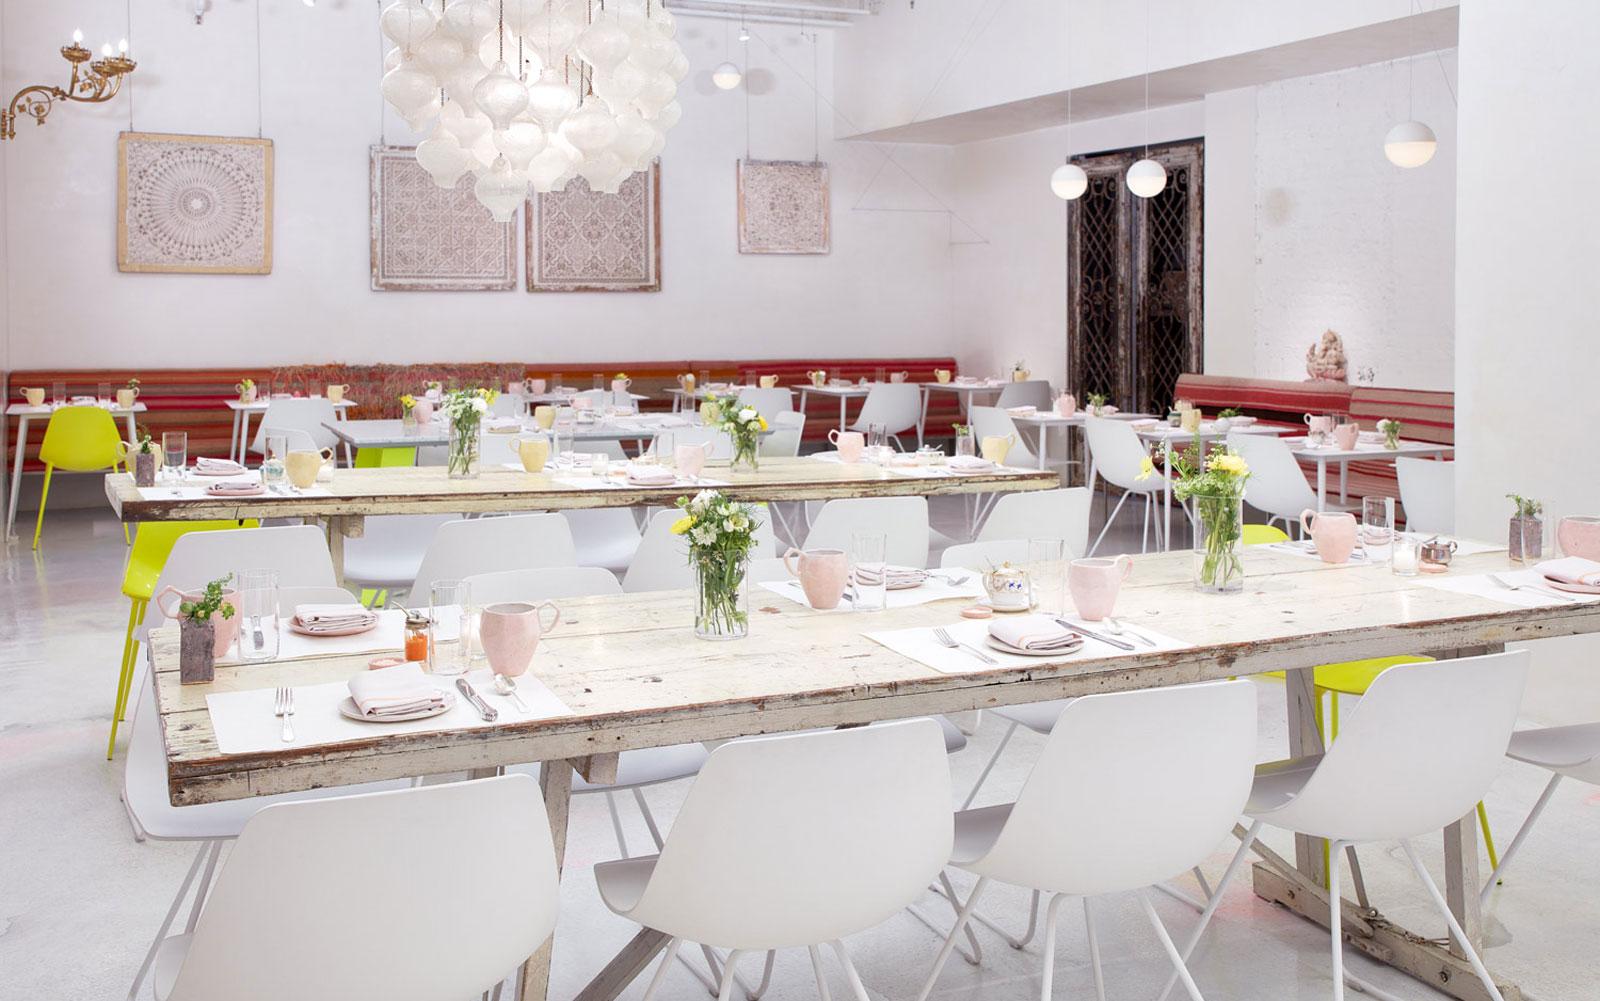 ABCV | Jean-Georges Restaurants